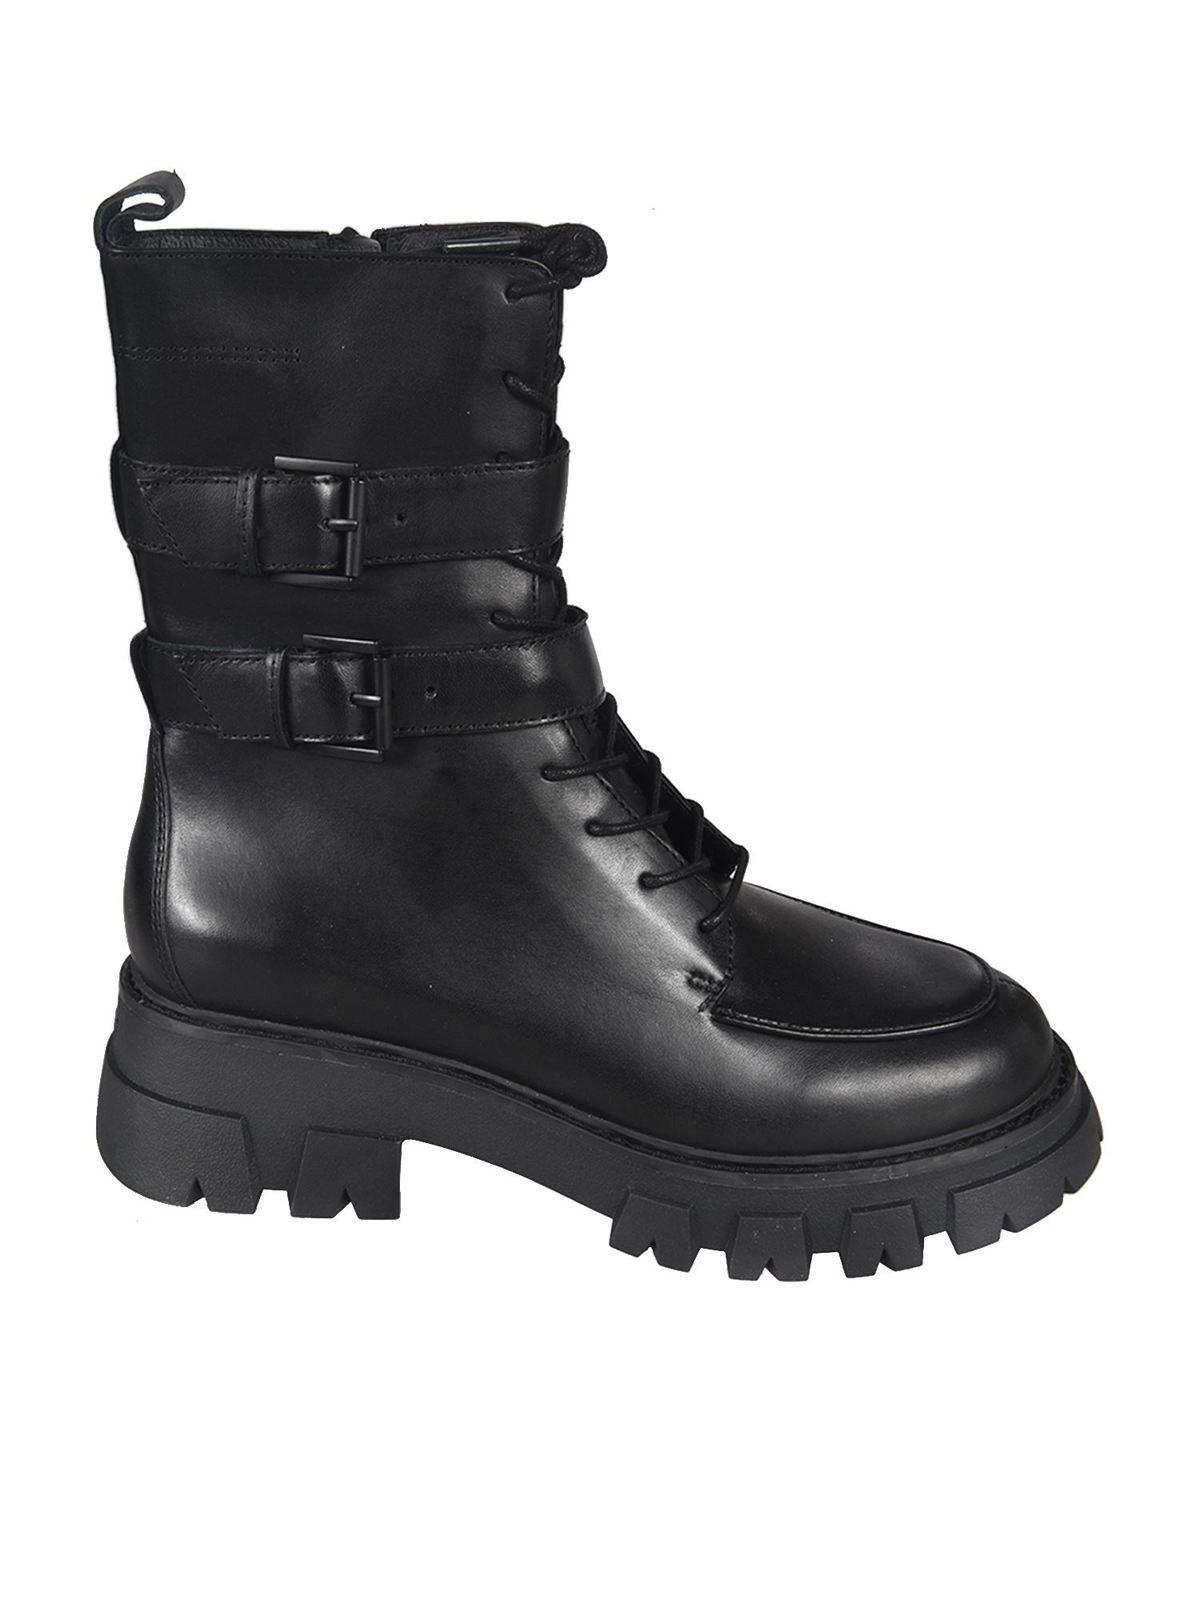 Ash Lars combat boots in black